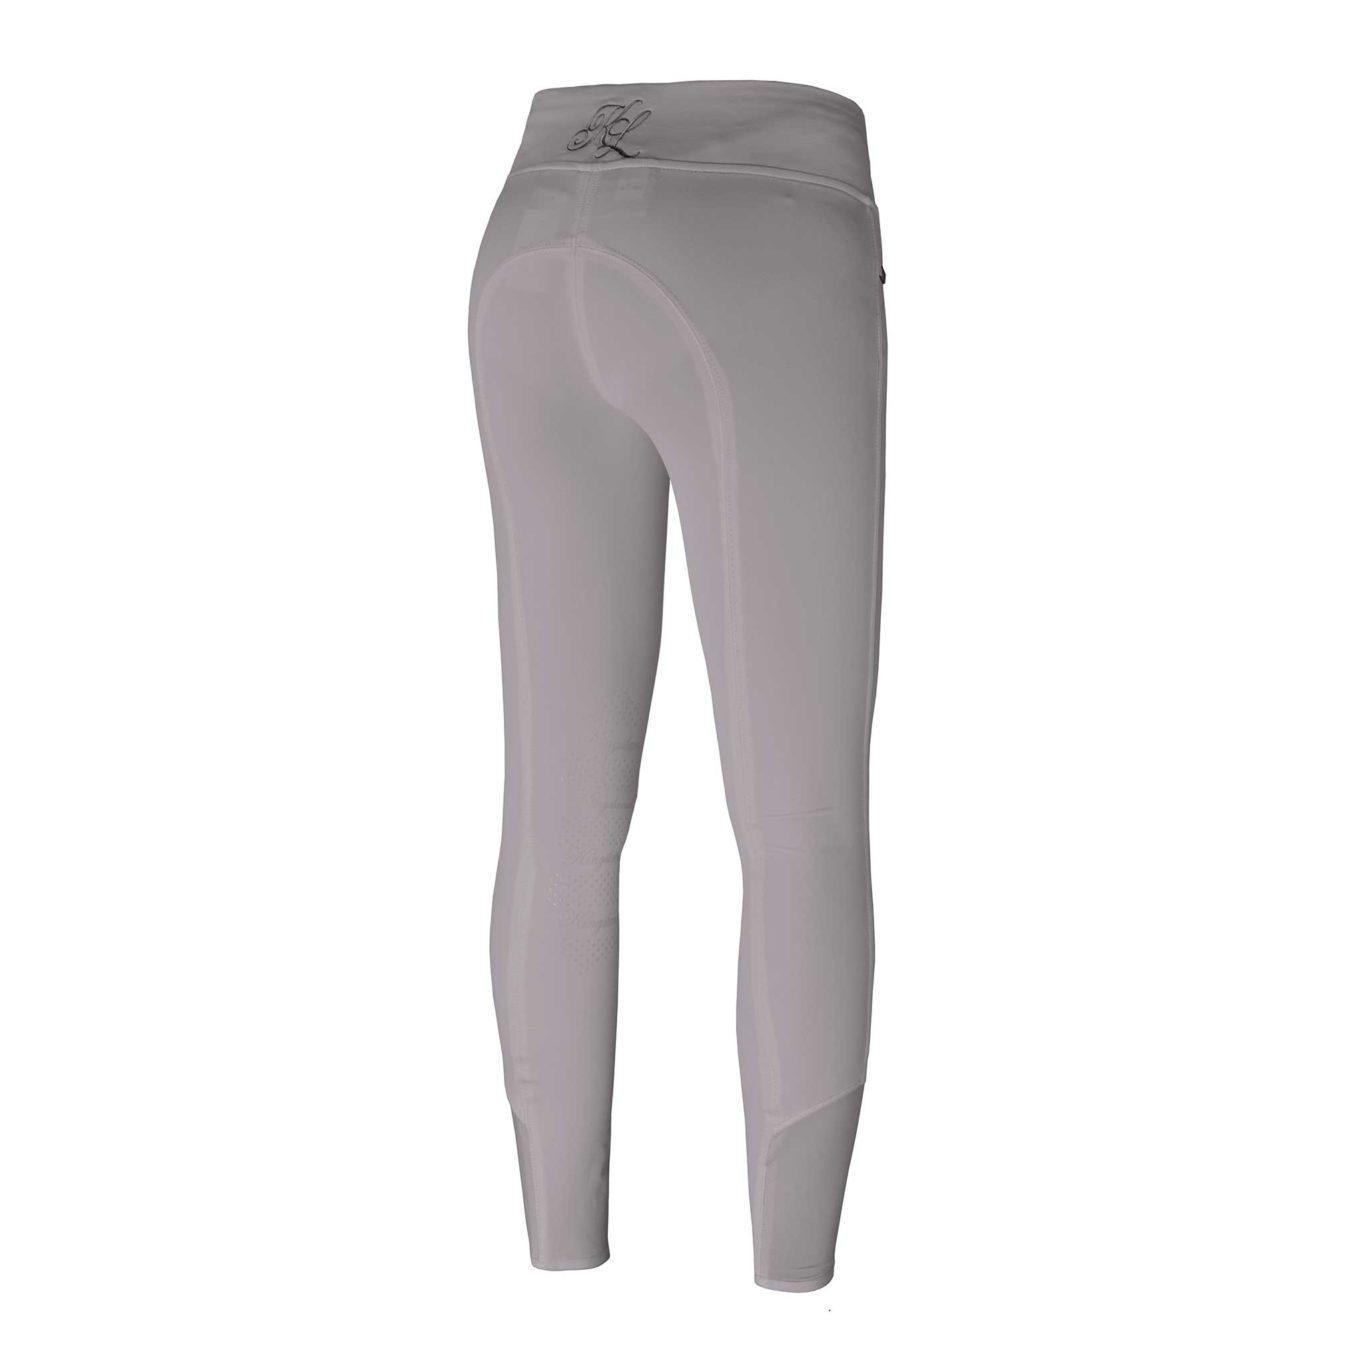 Pantalones con grip en las rodillas beige para mujer modelo Katja de Kingsland